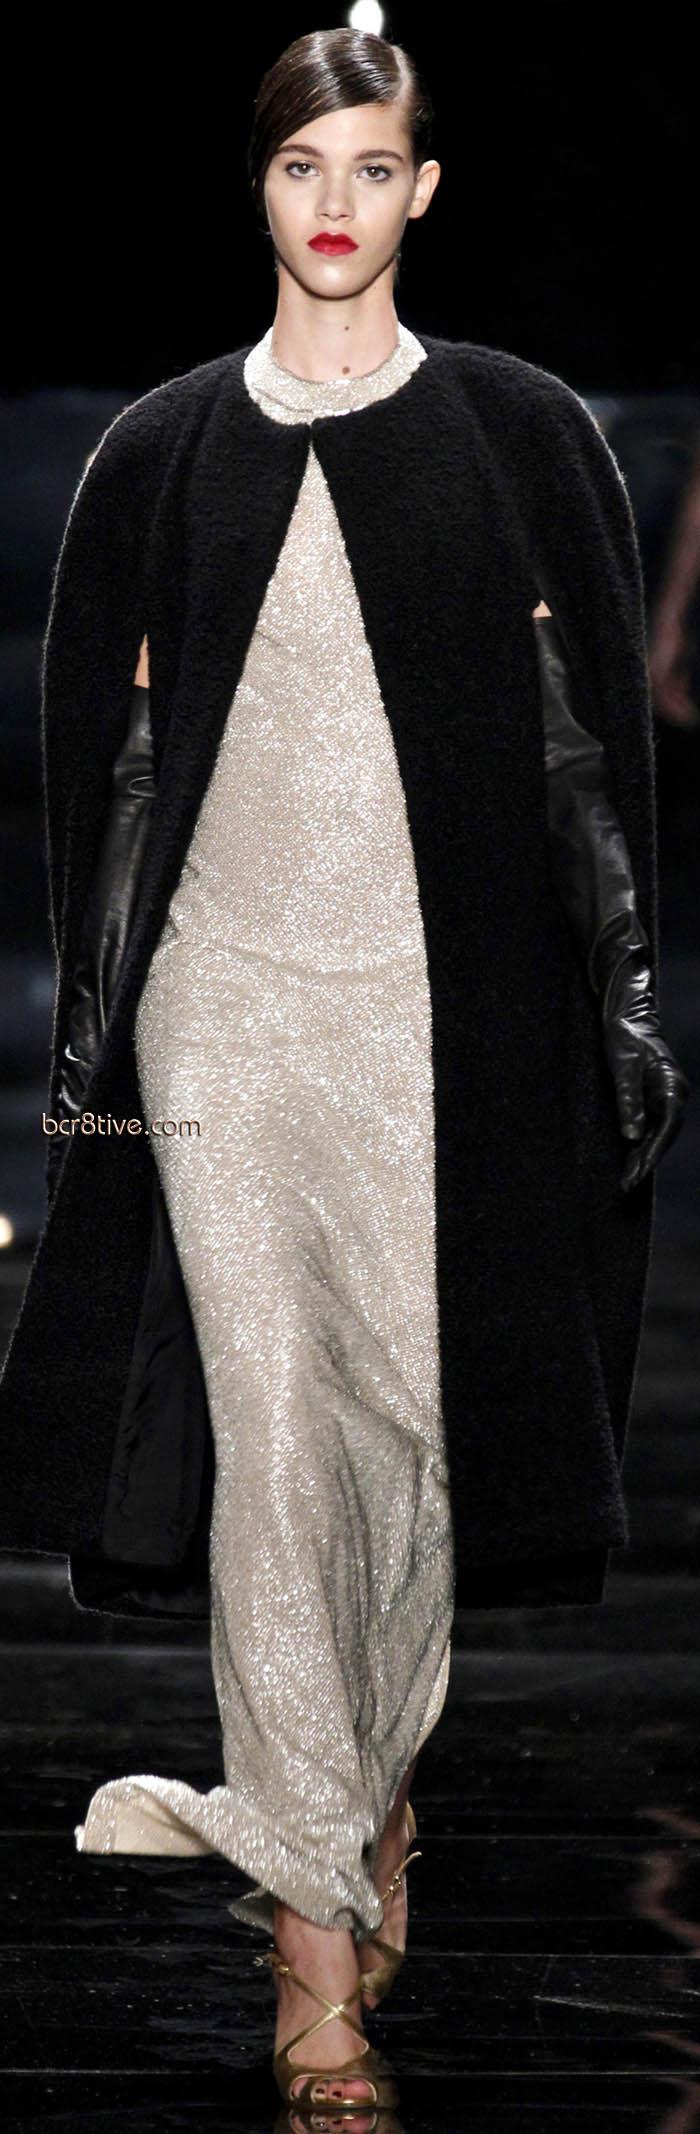 Reem Acra Fall Winter 2013 New York Fashion Week